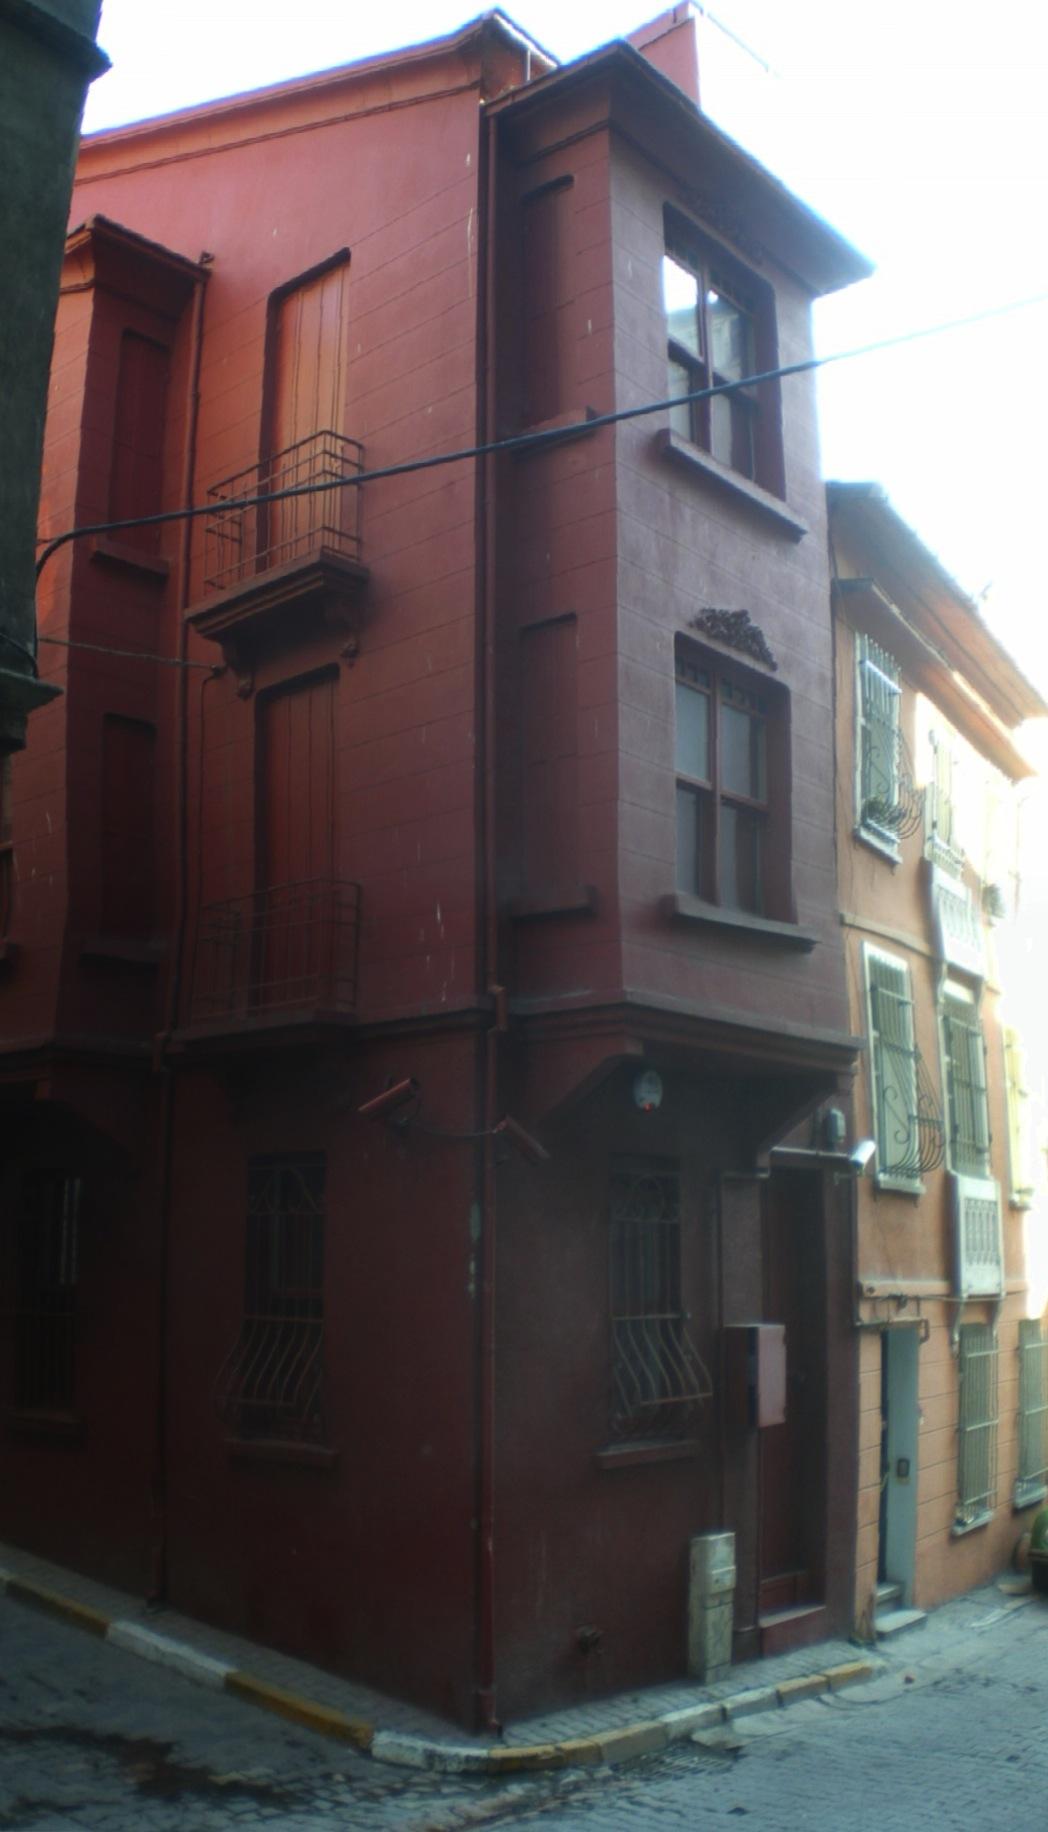 Музей невинности, Стамбул